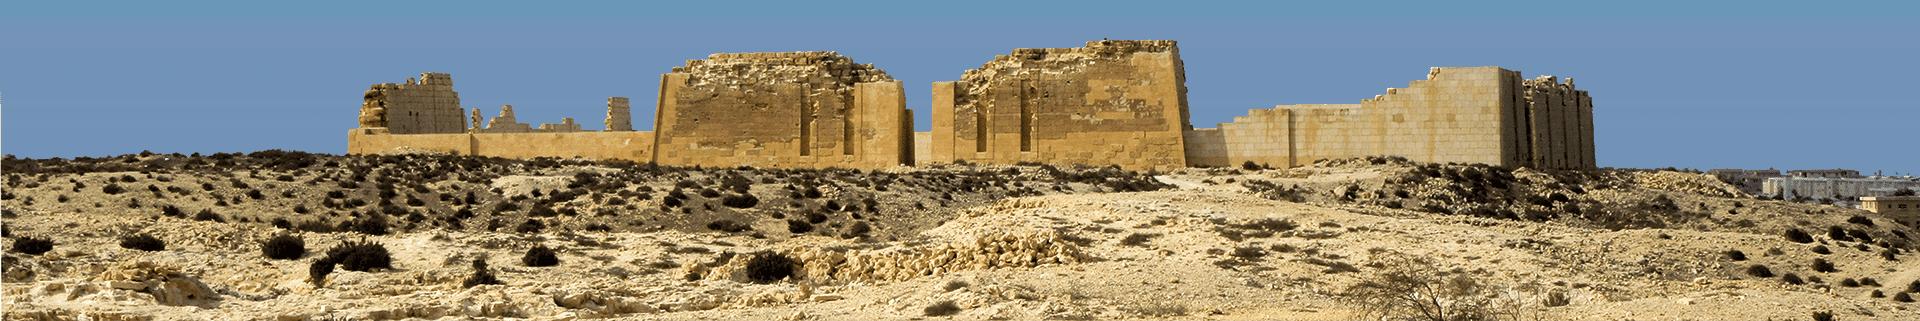 Taposiris Magna, Ancient World Tours, SELLING